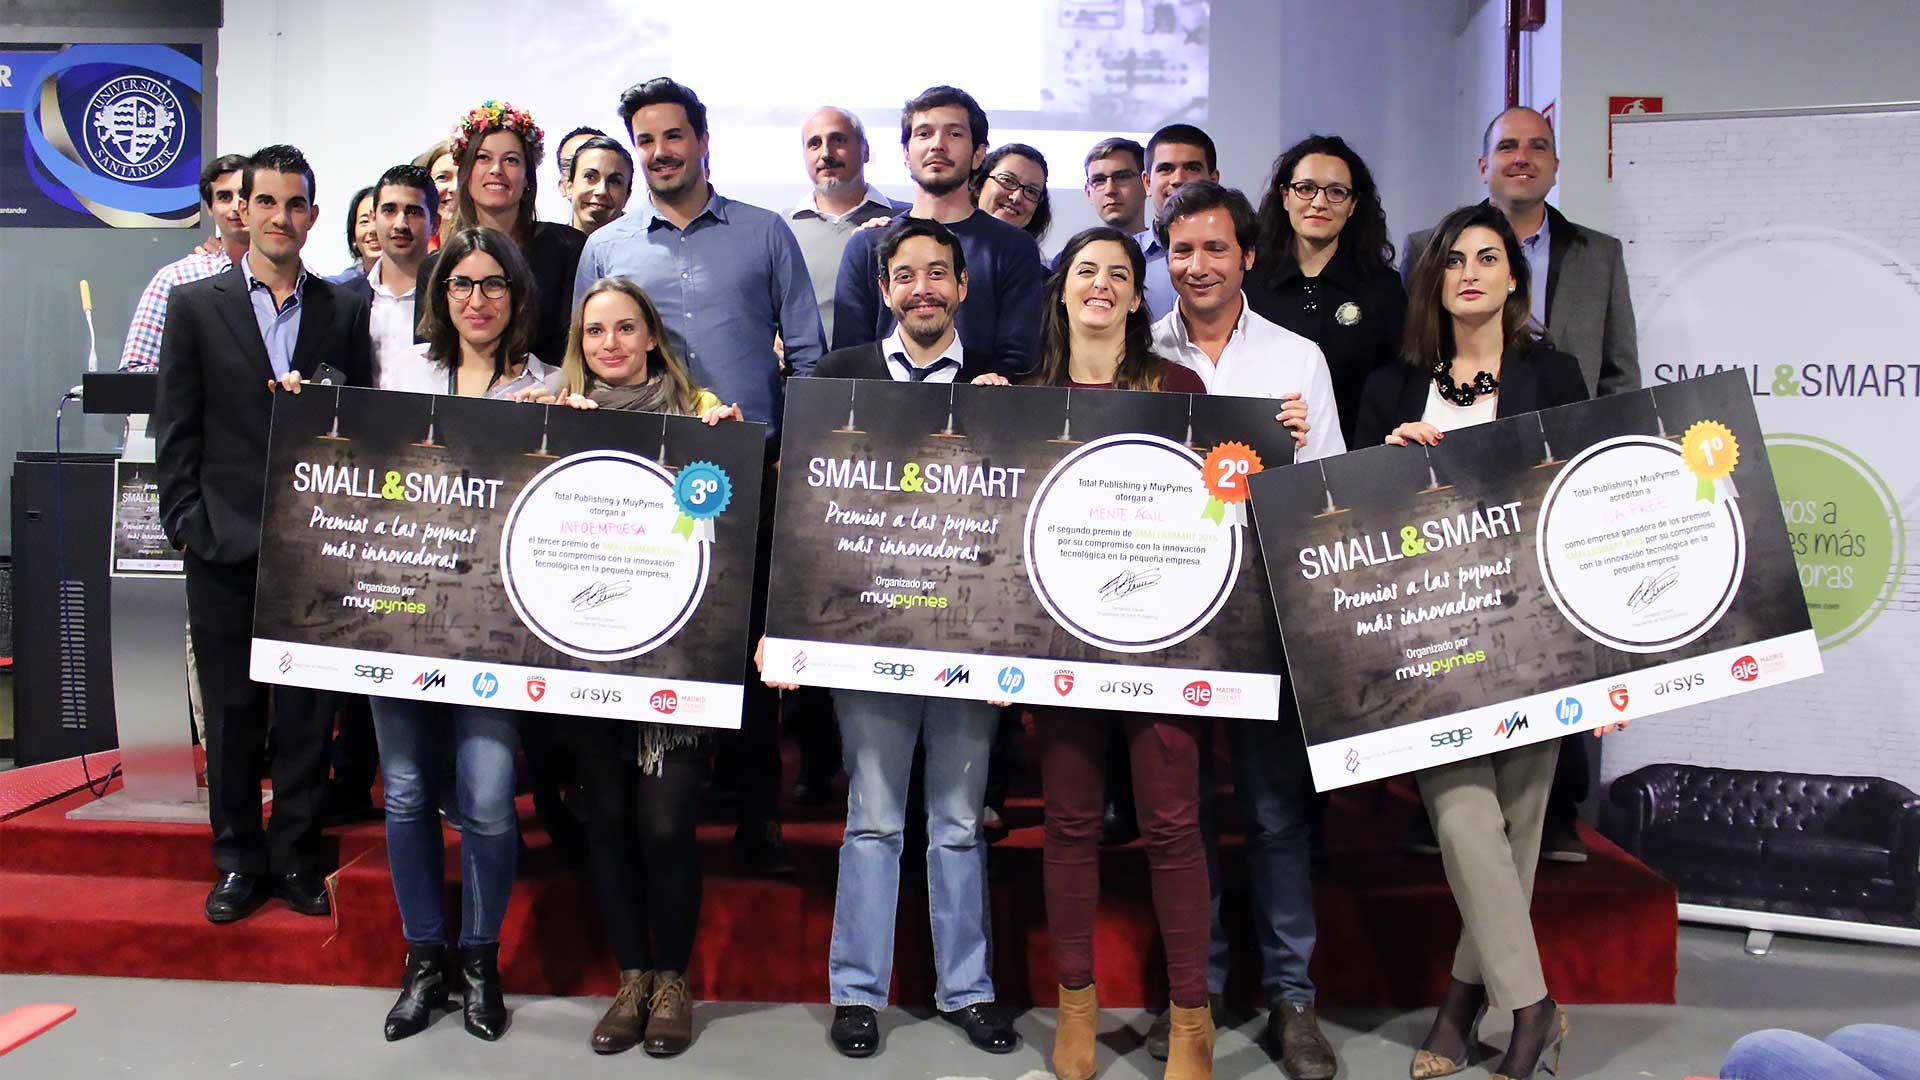 smallsmart-premios-startups-pymes-2015-ganadores-1